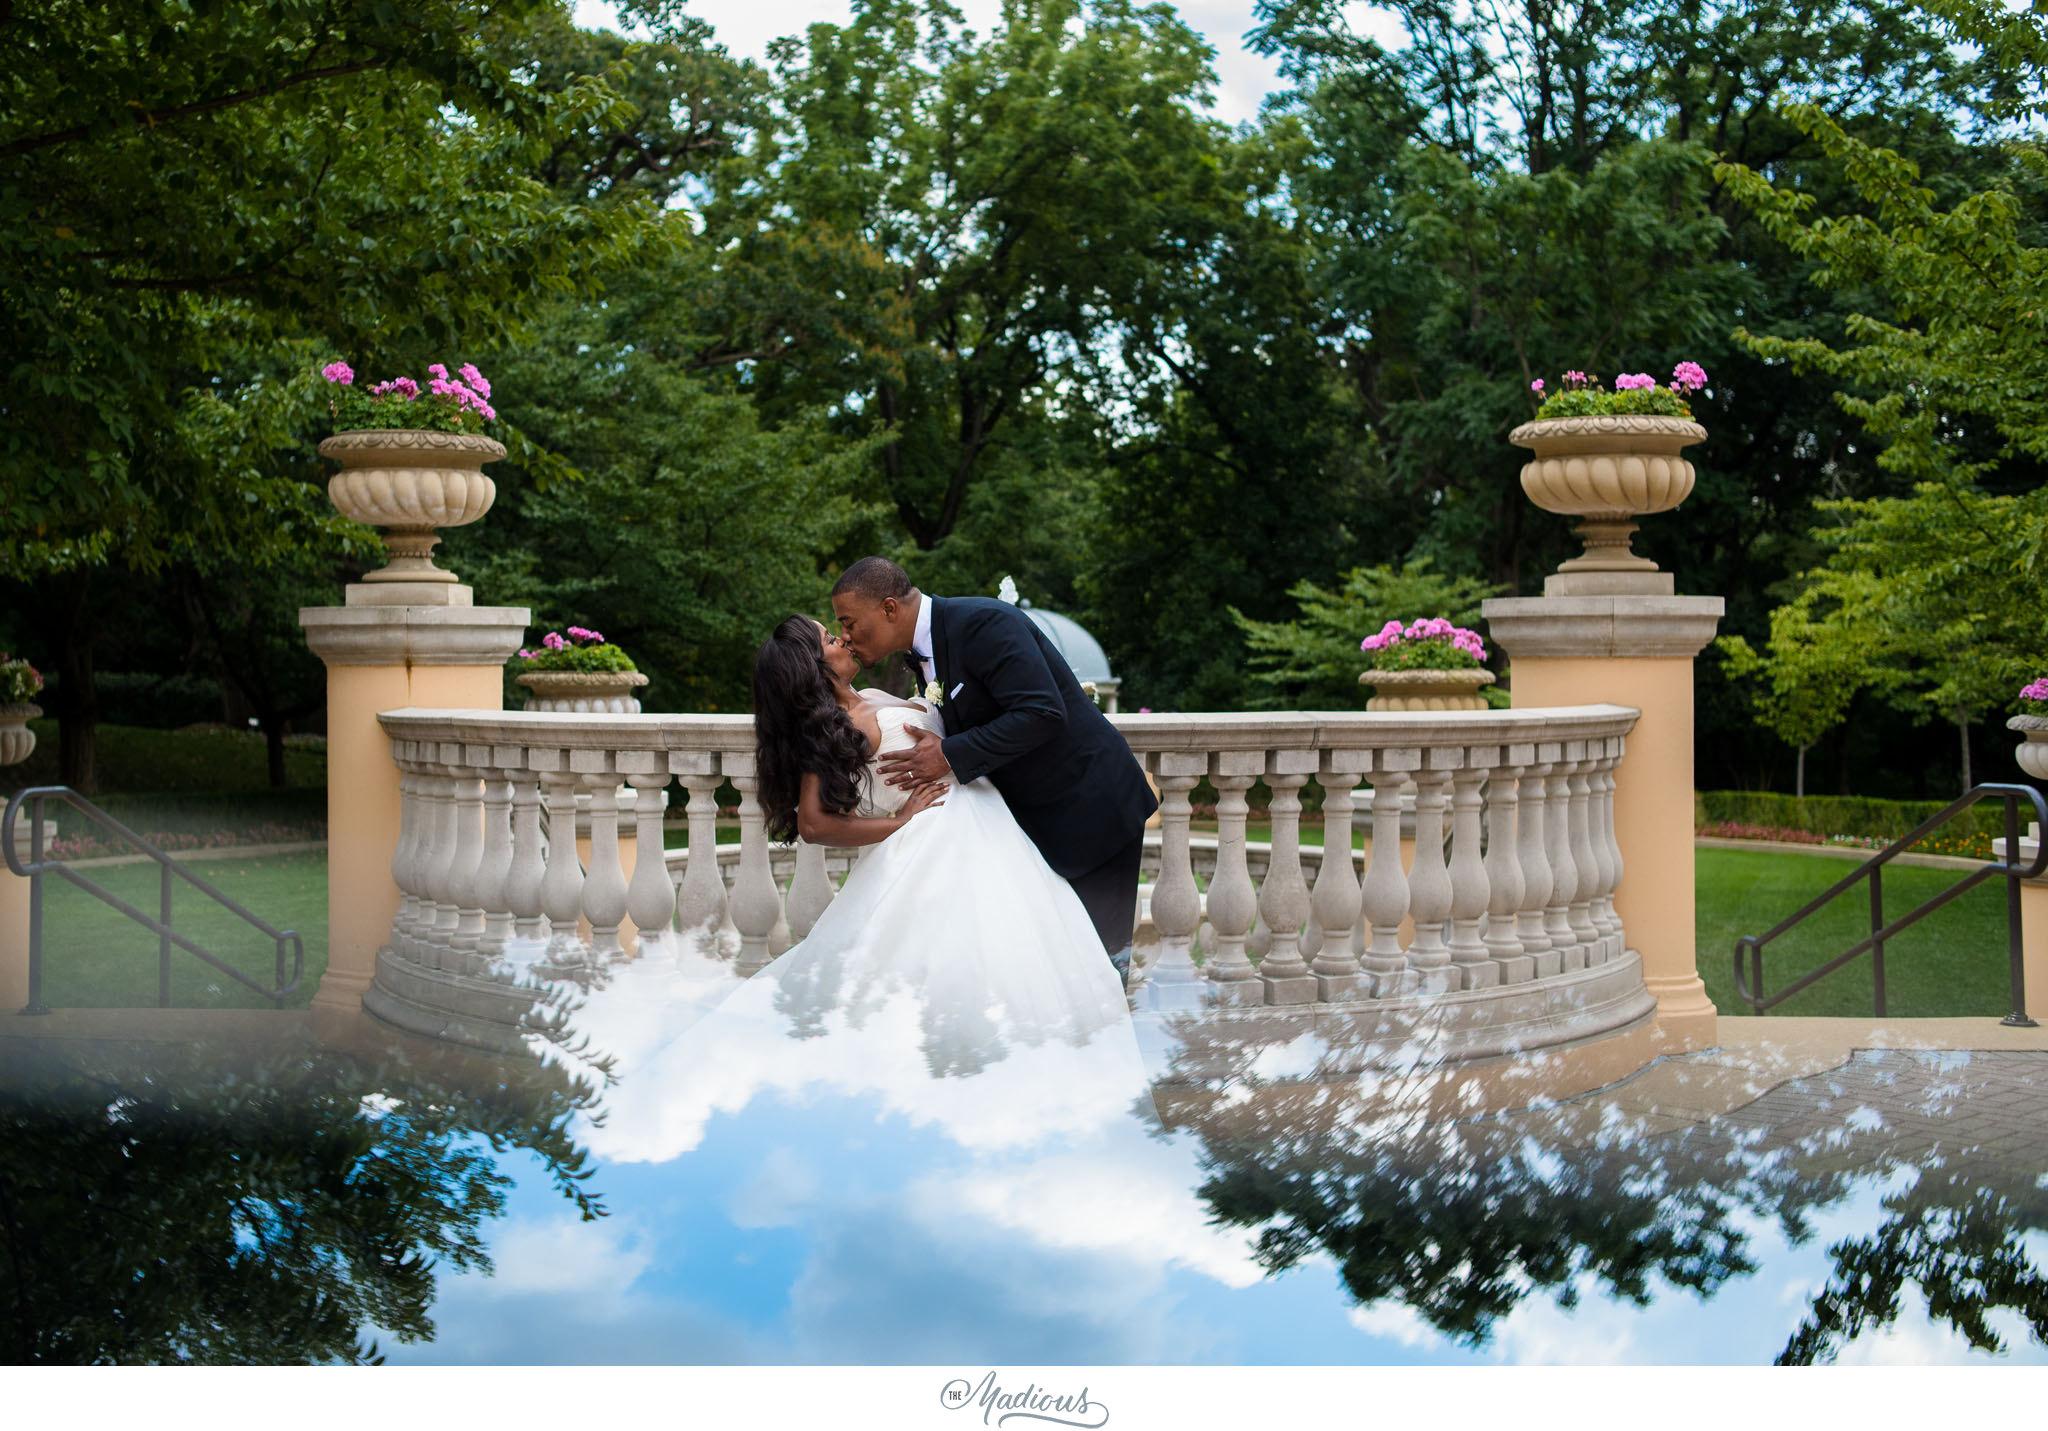 nmwa+wedding,+women+in+the+arts+wedding,+ethiopian+wedding,+dc+wedding+0146.jpg